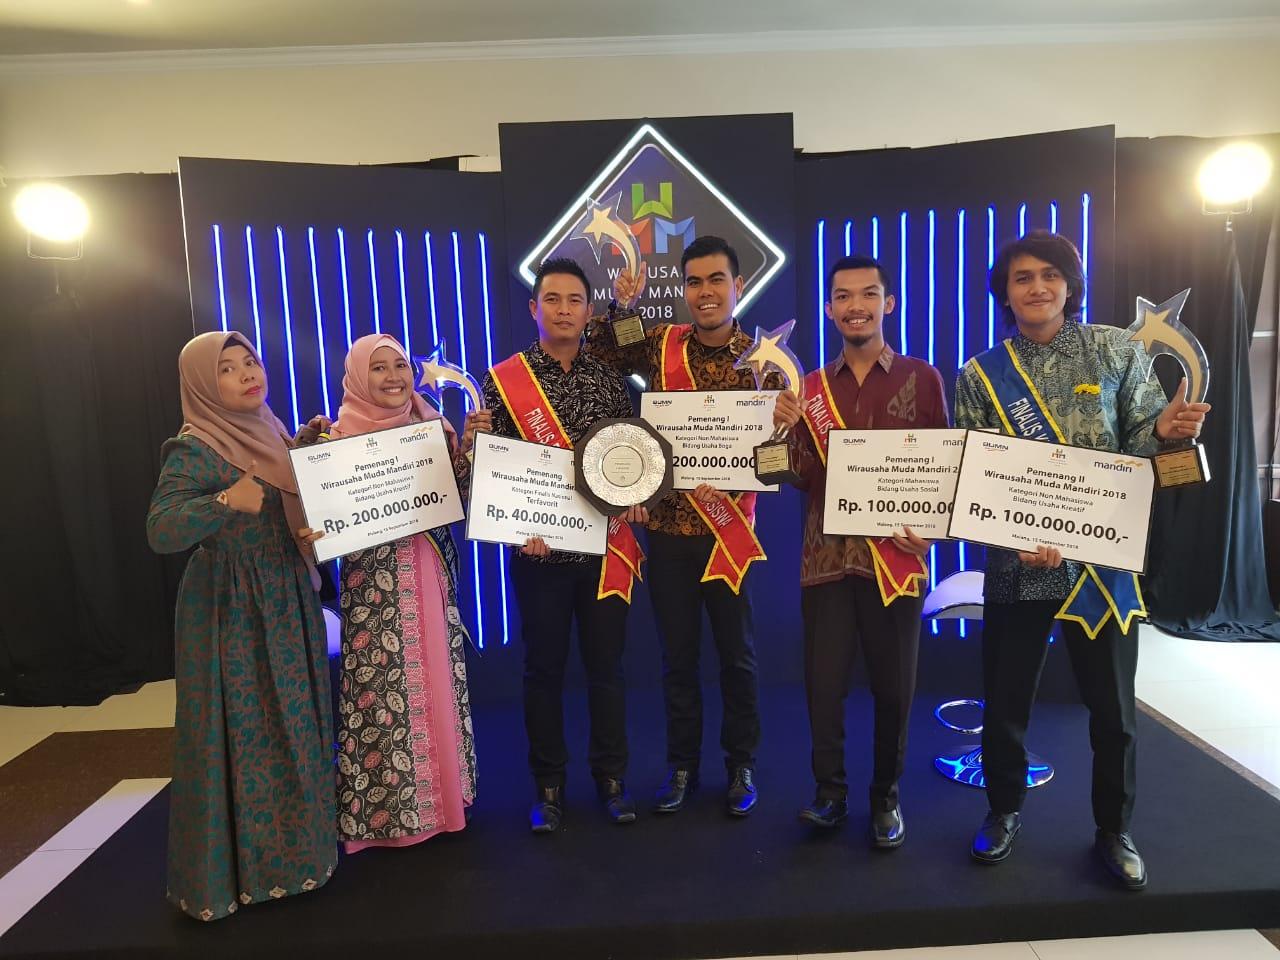 Komunitas TDA Juara WMM 2018